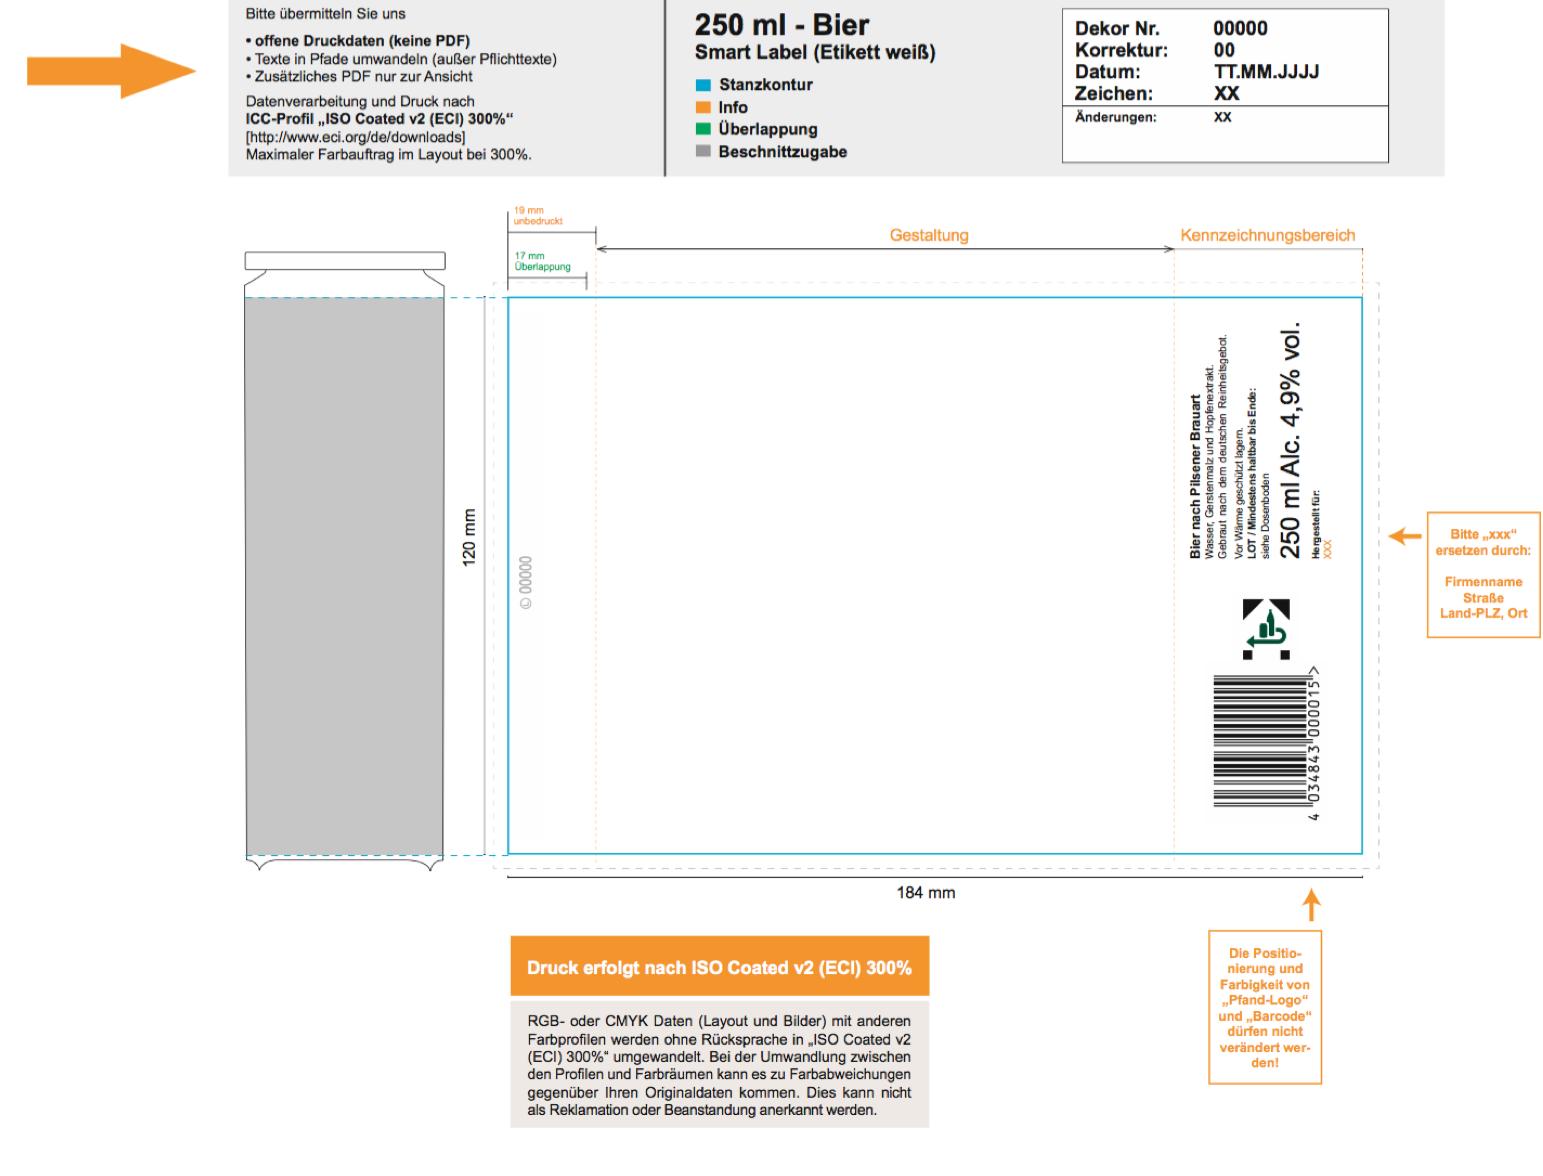 250ml_bier_smartlabel_DE-pdf-1-Seite-2016-03-16-14-28-14